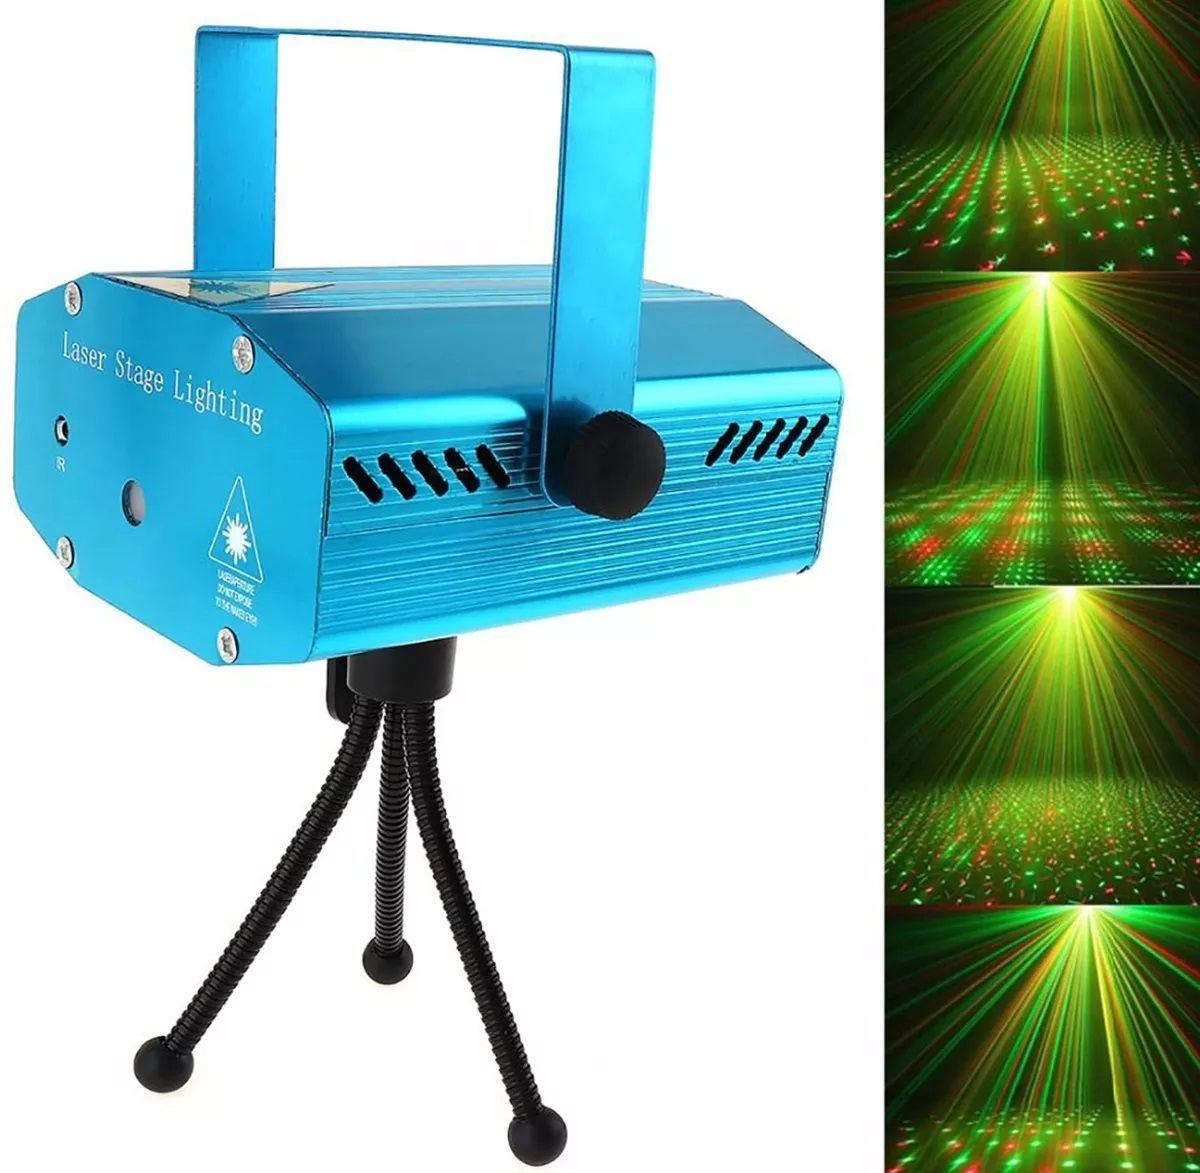 Kit Mini Laser Projetor Holográfico + Strobo 12 Leds Branco - SD-09+YX-043W